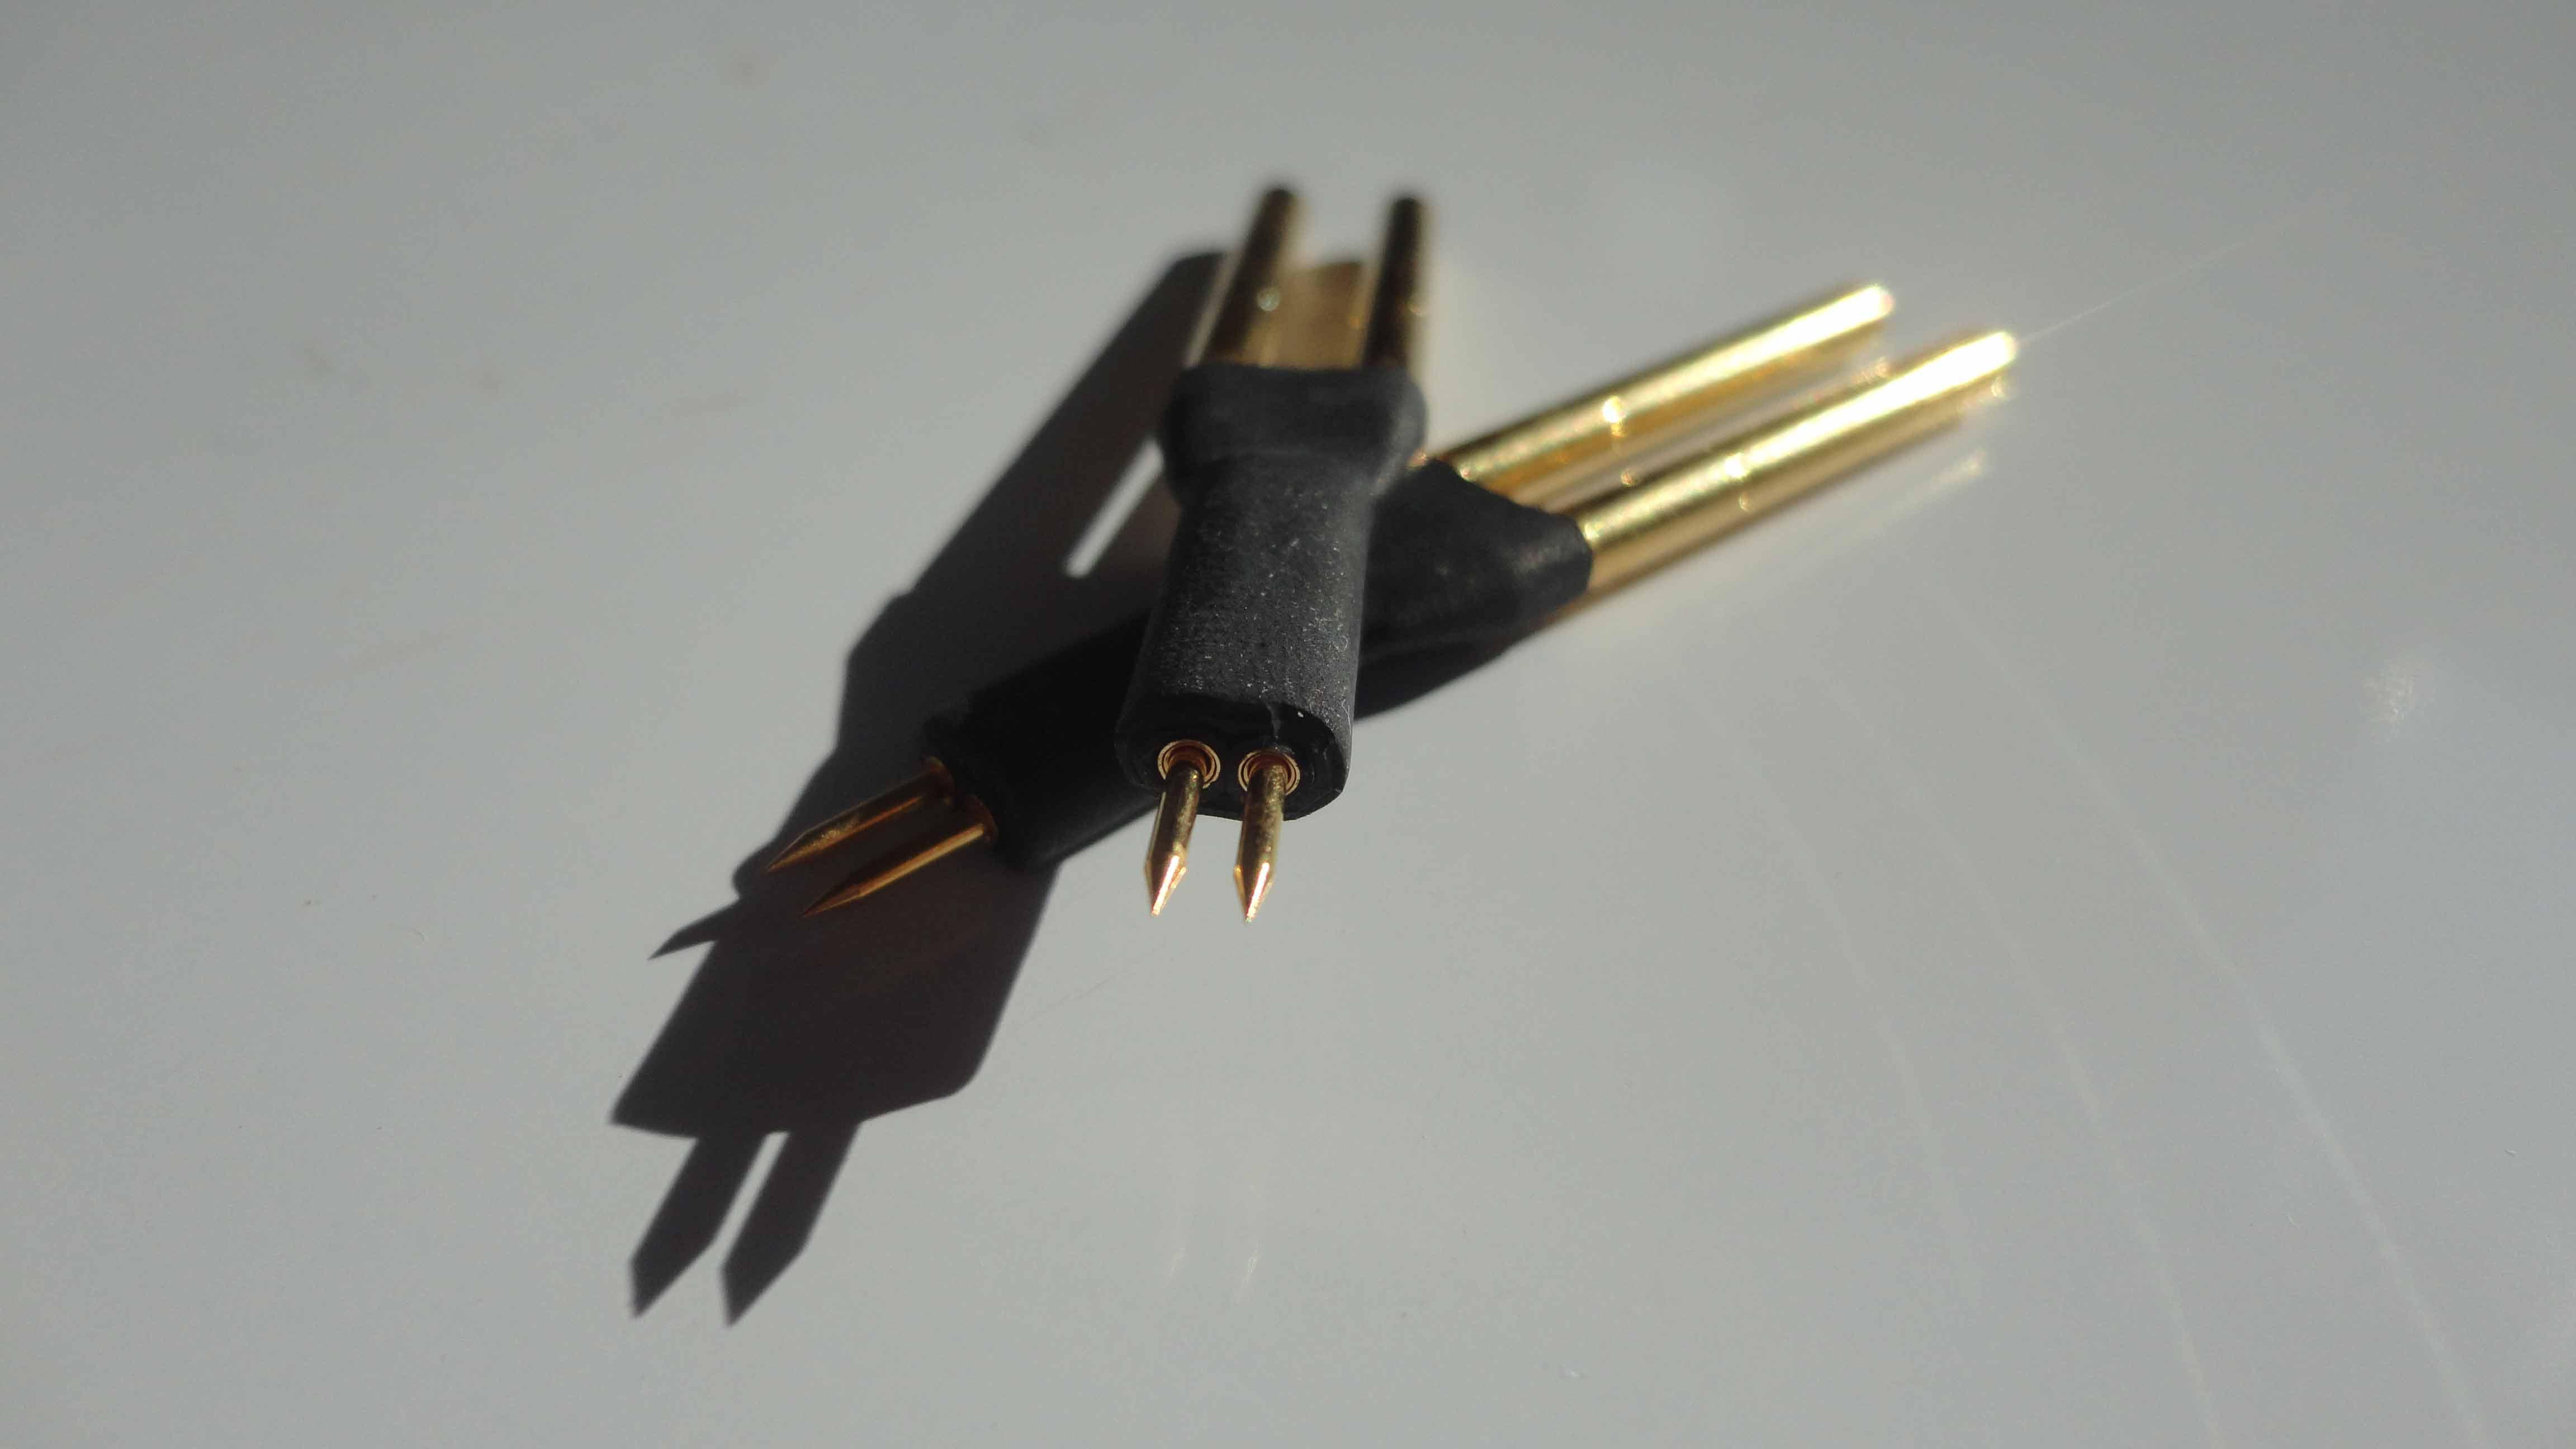 Tete de sonde DRM 4015 2 mm pour micro ohmmètre